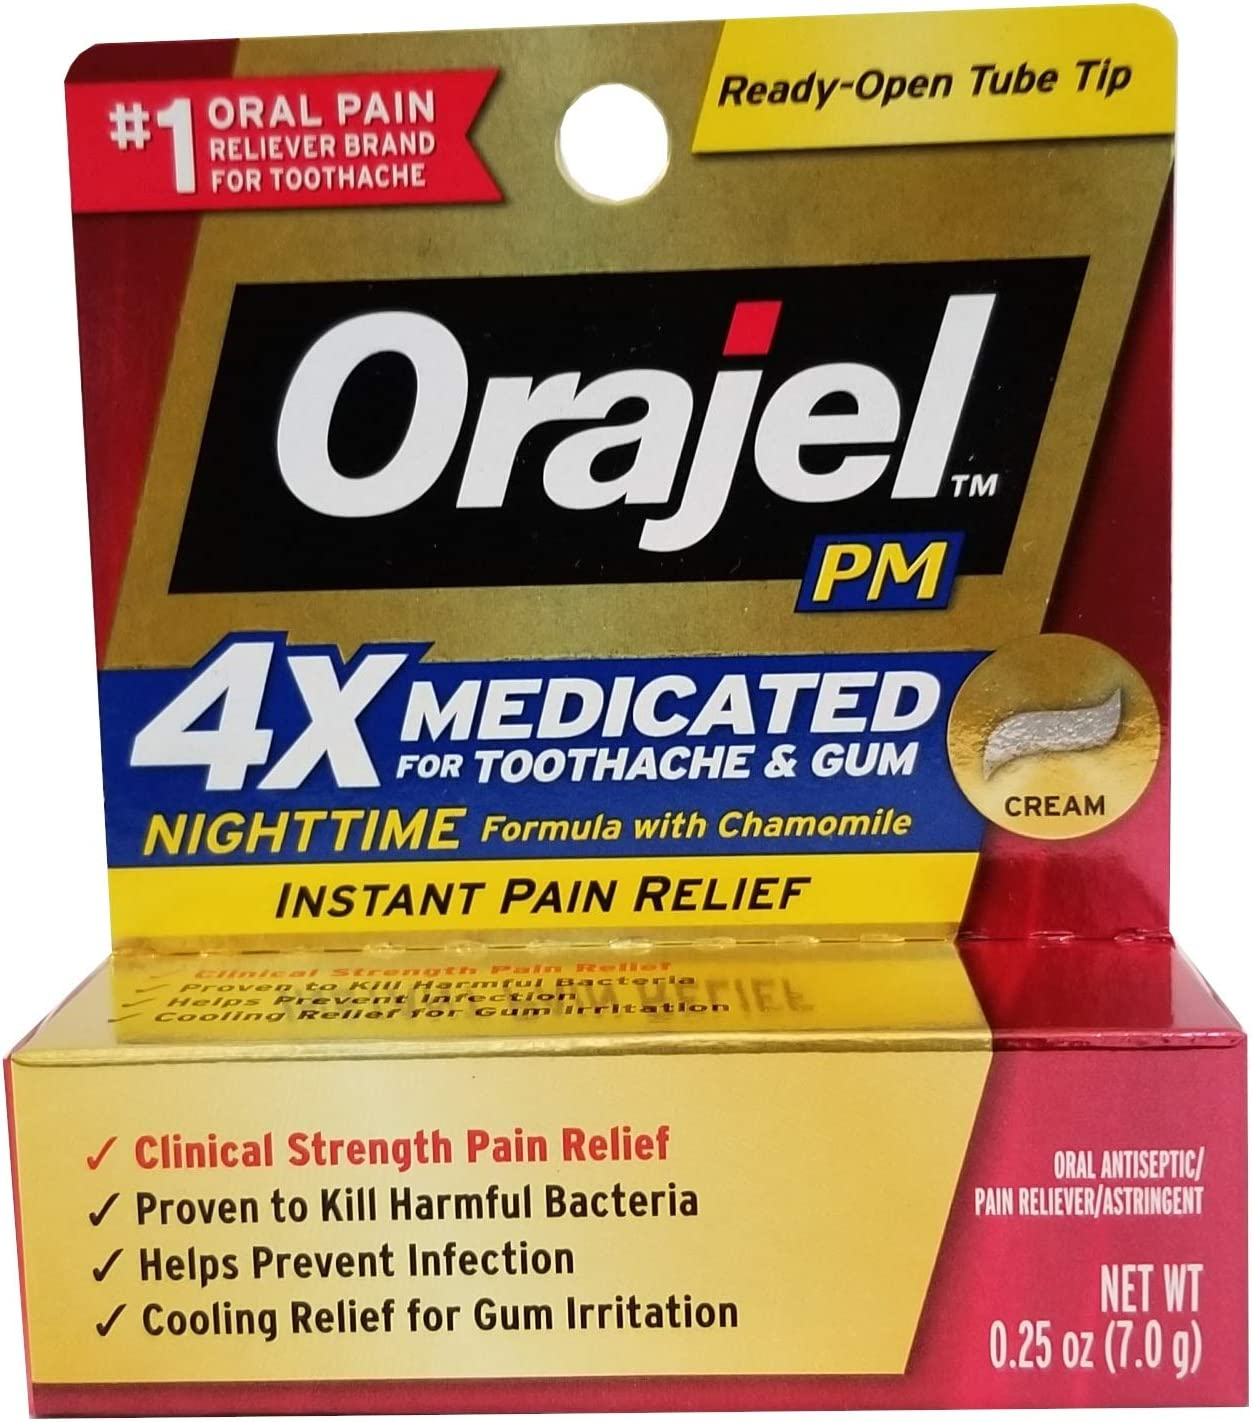 Orajel Maximum Strength Nighttime Toothache Pain Relief Cream - 0.25 Oz: Health & Personal Care